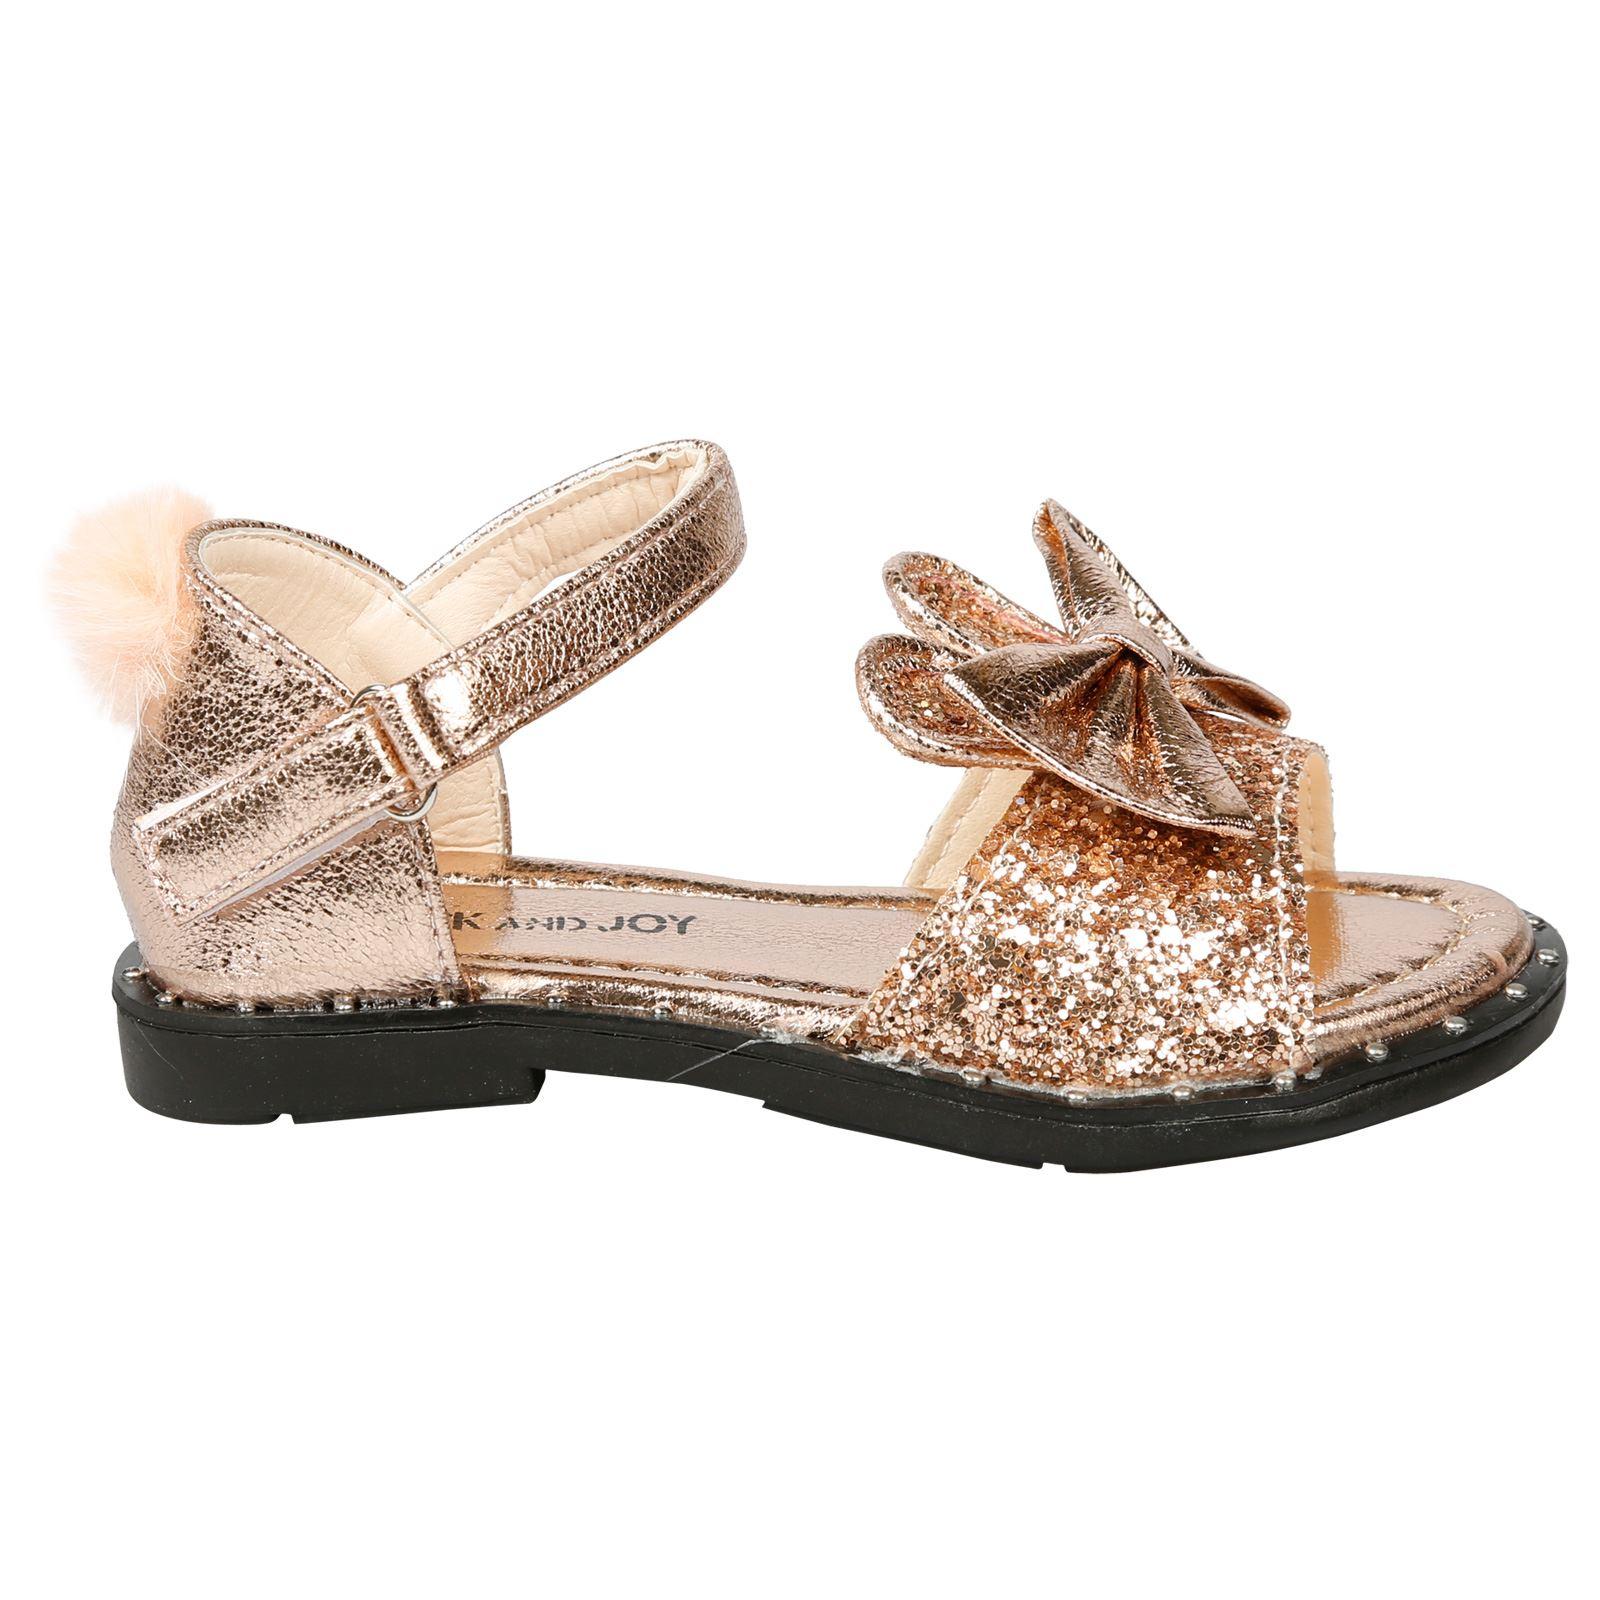 Brand new Bertie gold glitter sandal size 4